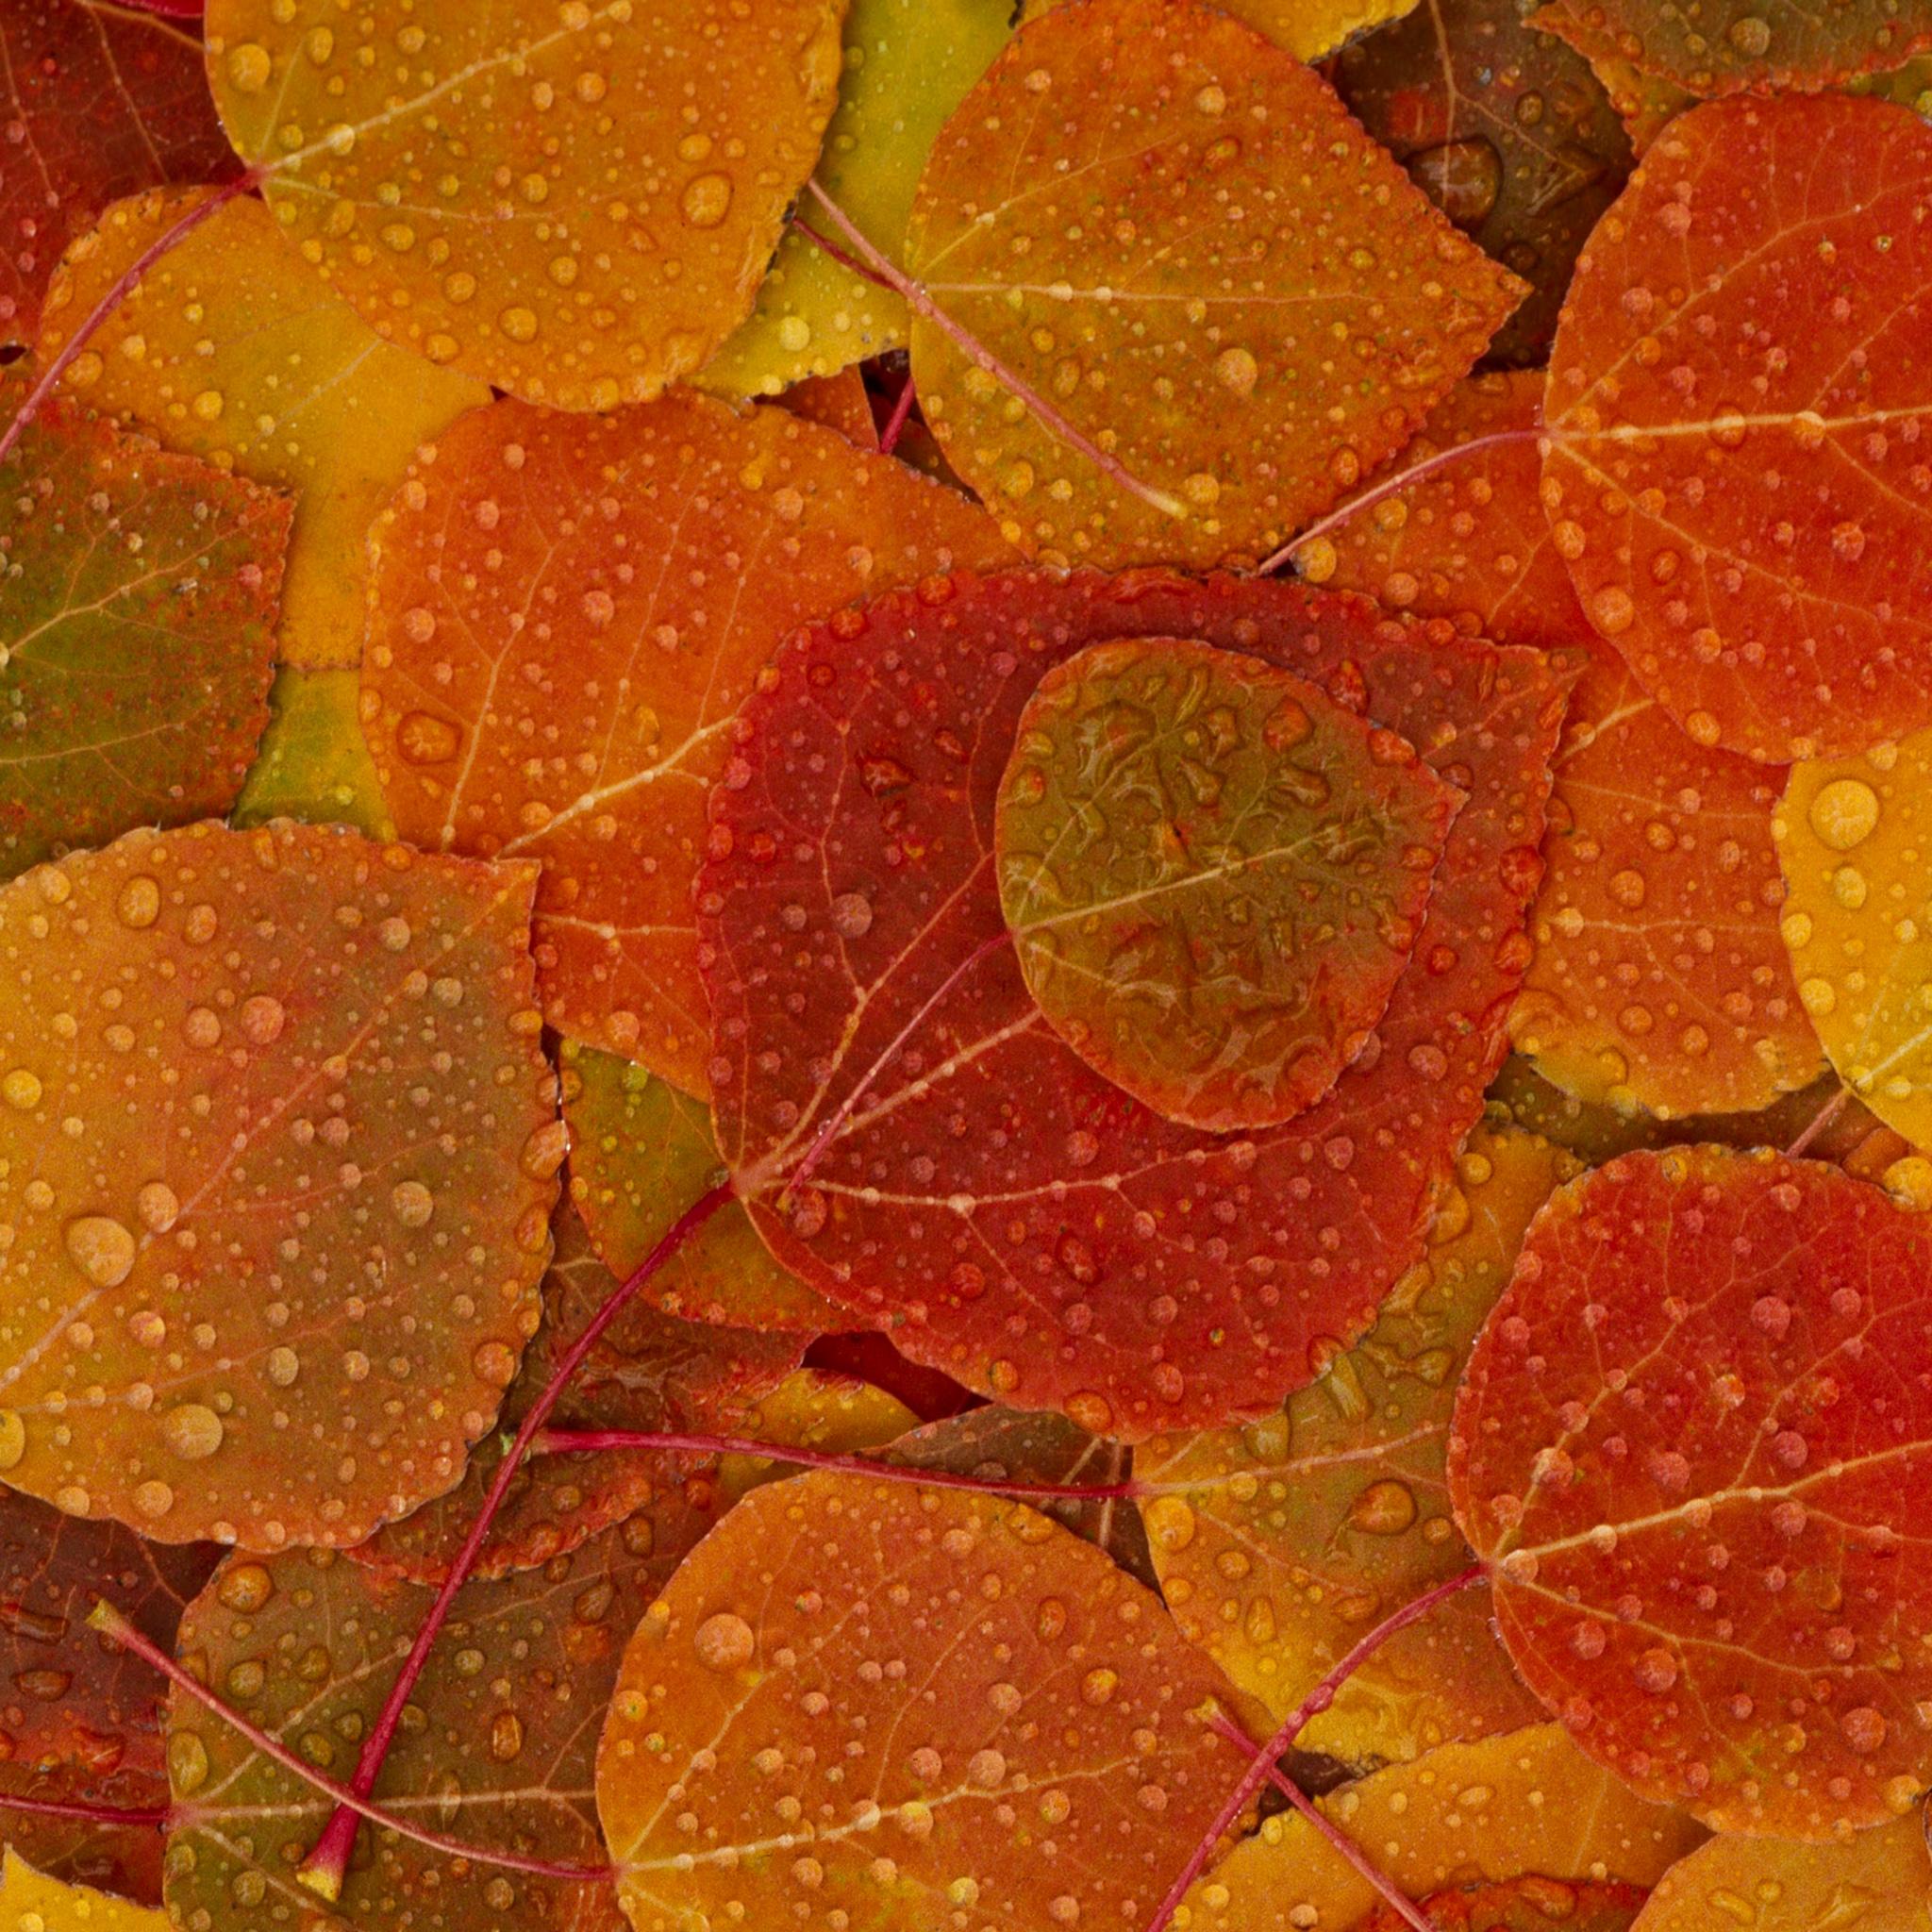 Осенние обои для iPad: xage.ru/osennie-oboi-dlja-ipad